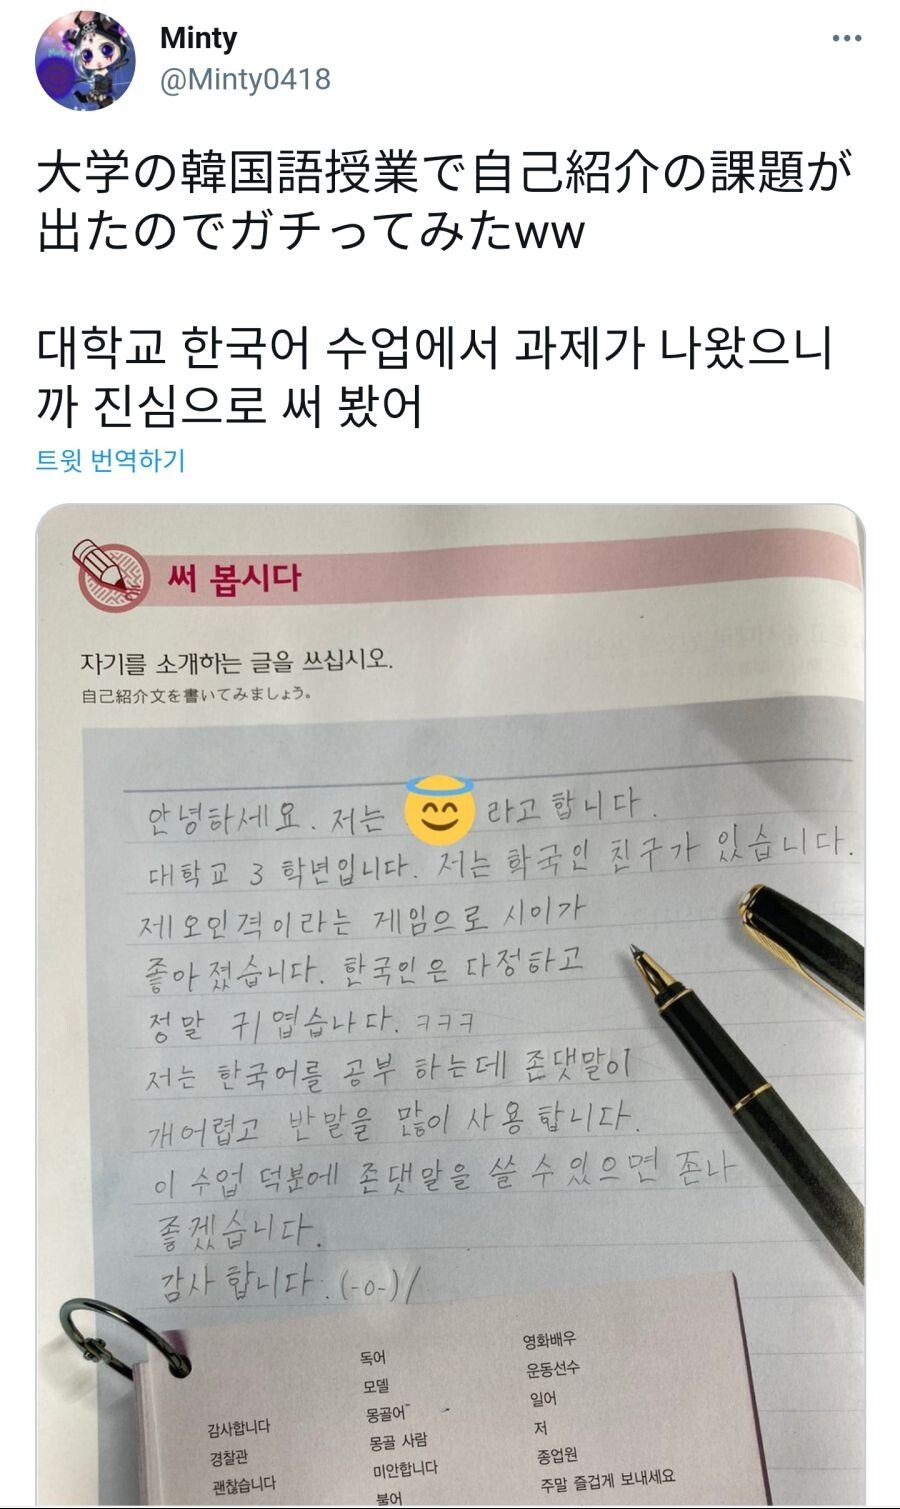 035d7578bace03e36ed7298f5b0f55f3.jpg 일본인이 한국어 수업시간에 쓴 자기소개서.